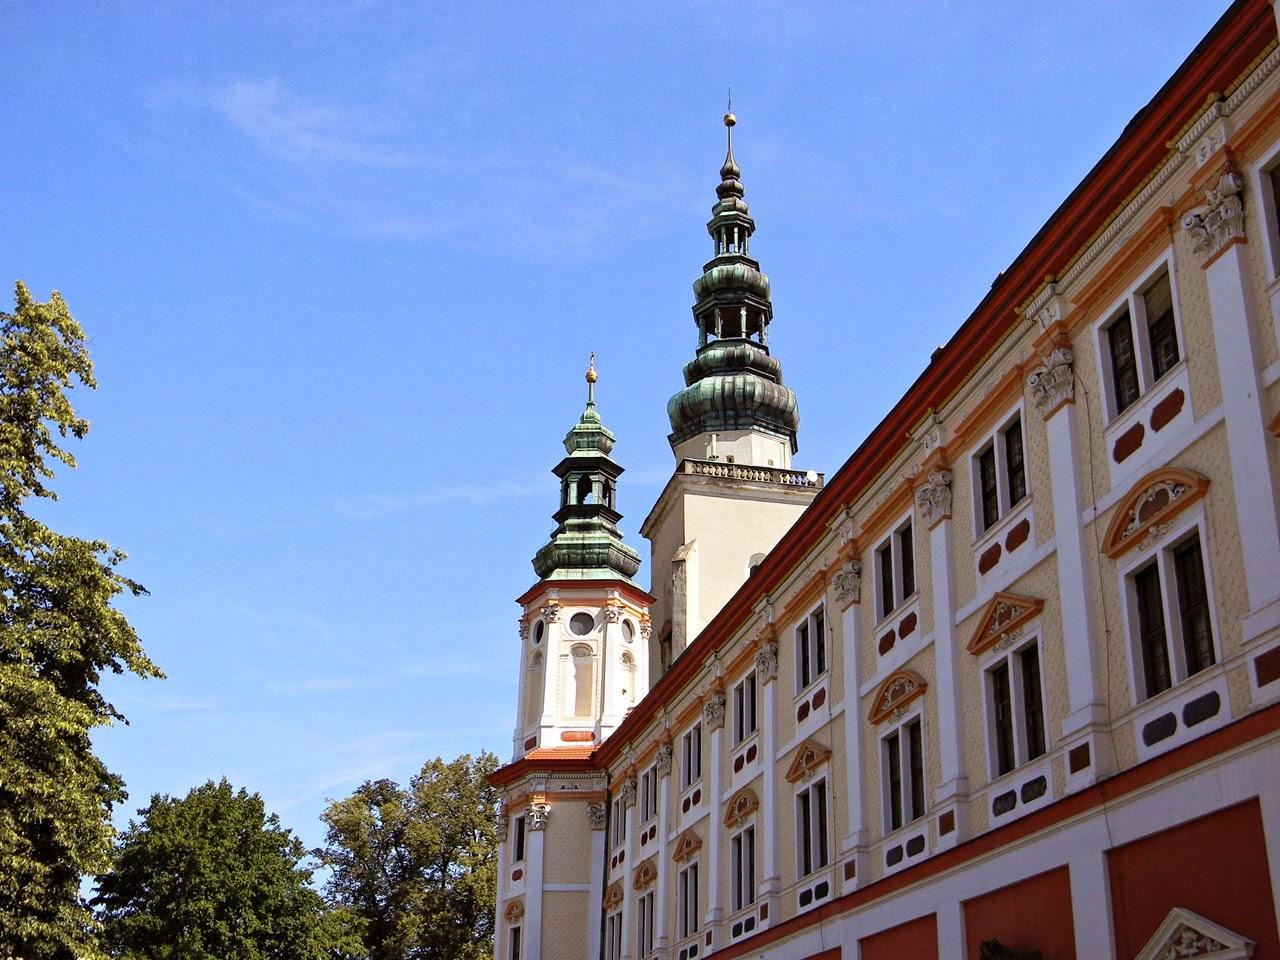 Henryków, klasztor, cystersi, kościół